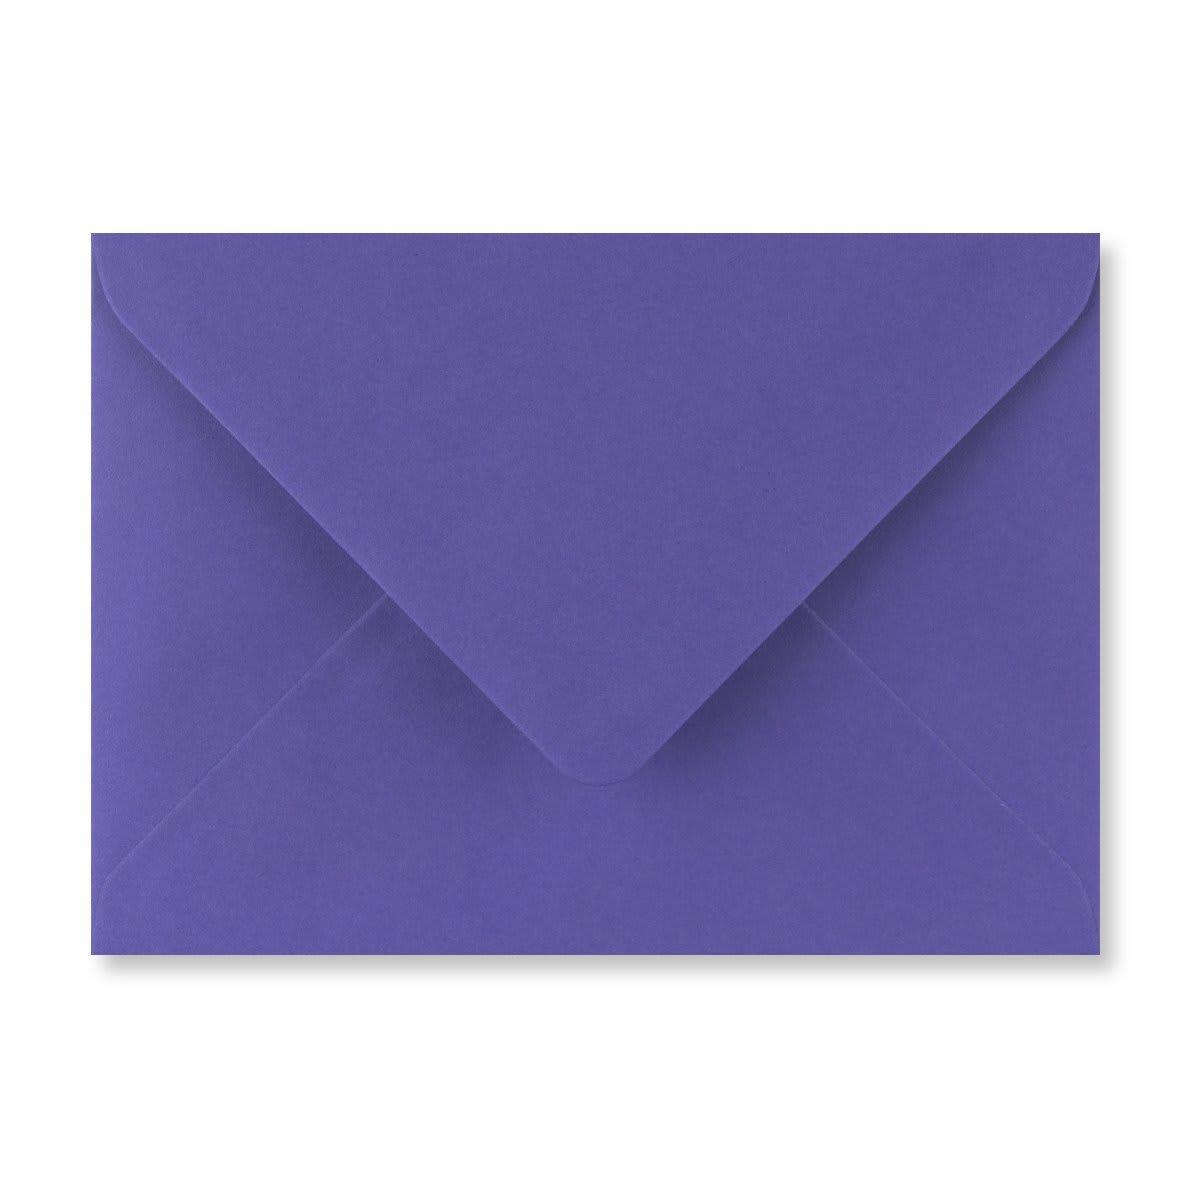 IRIS BLUE 125 x 175mm ENVELOPES